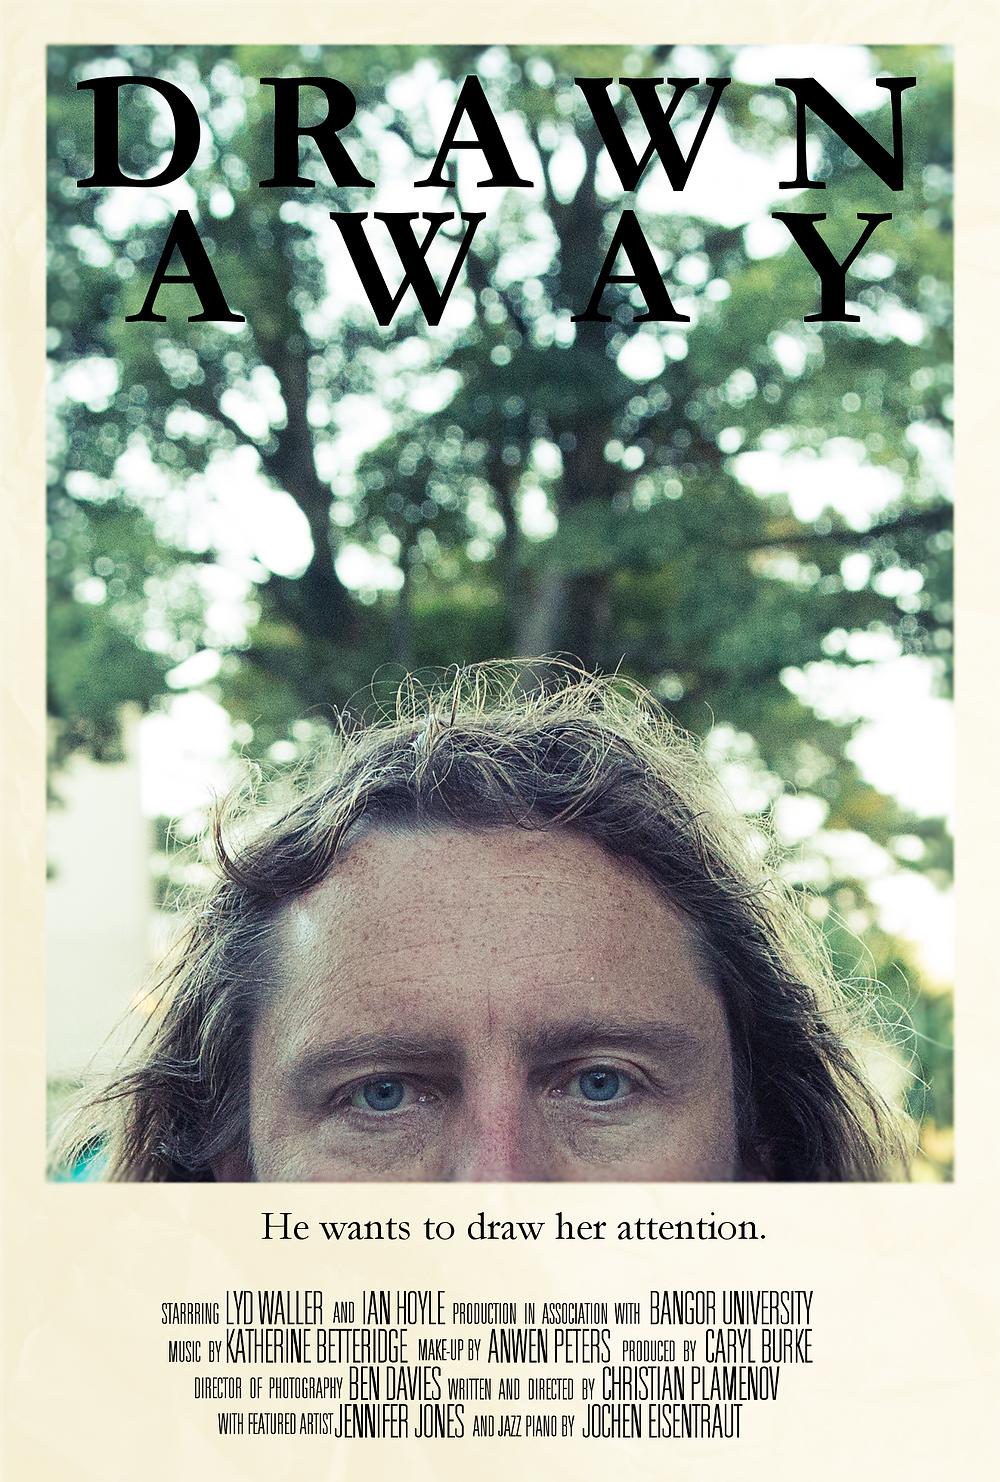 short film review Drawn Away